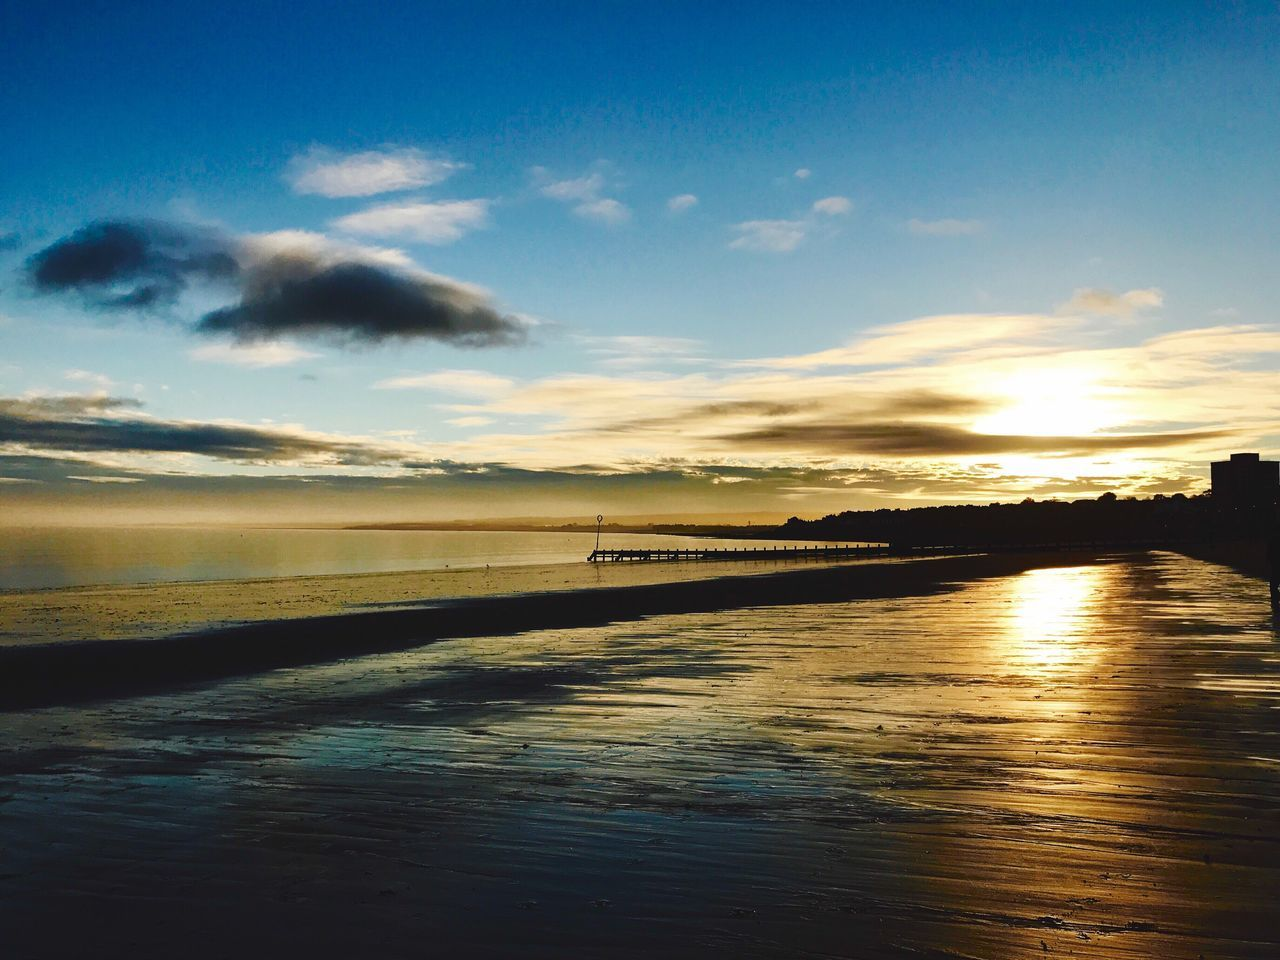 Sunset #sun #clouds #skylovers #sky #nature #beautifulinnature #naturalbeauty #photography #landscape Portobello Beach, Edinburgh Beauty In Nature Sky Water Cloud - Sky Beach Photography EyeEm Best Shots Sunrise_Collection EyeEmBestPics